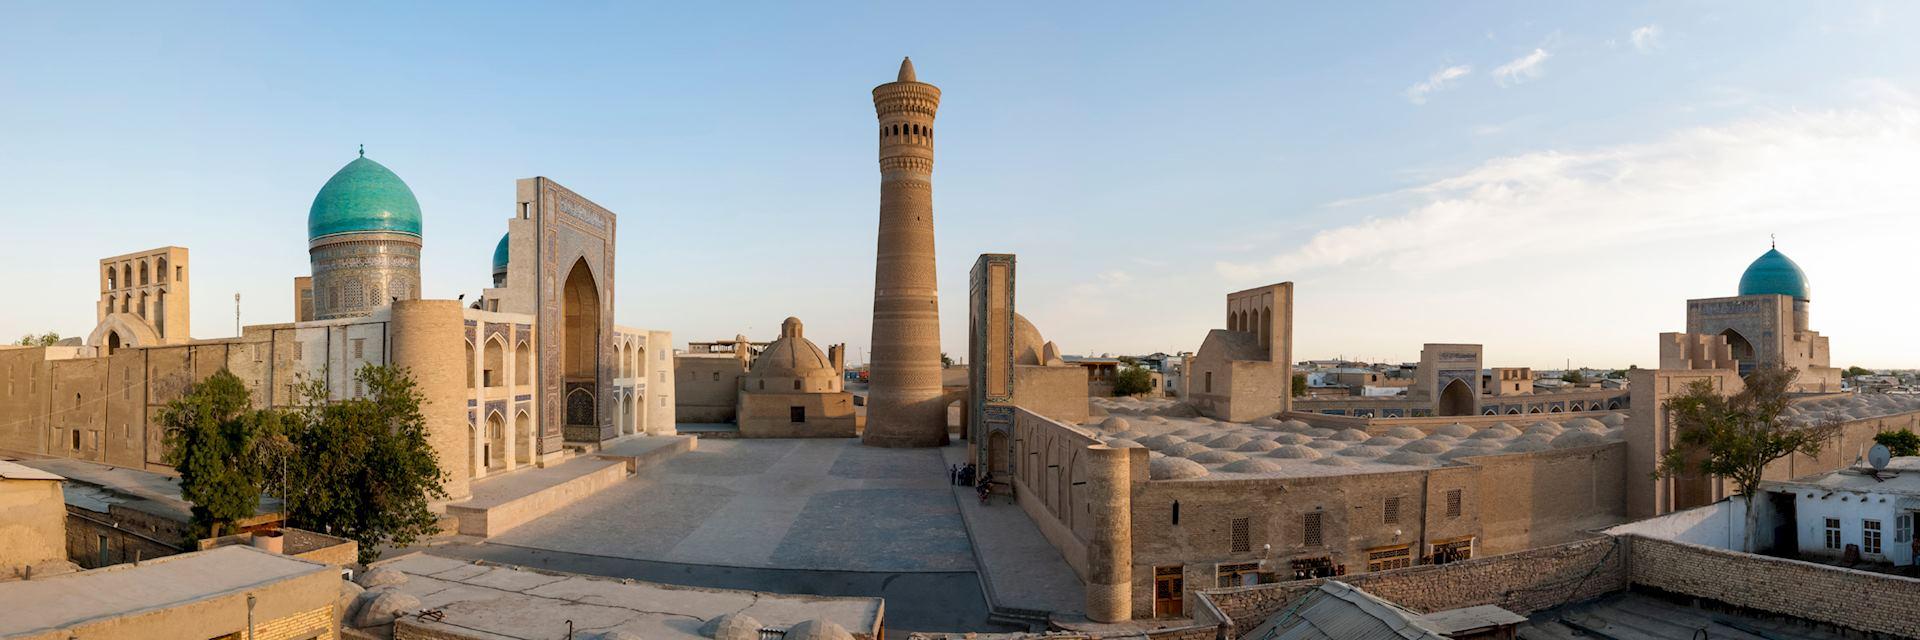 Buhhara old town in Uzbekistan